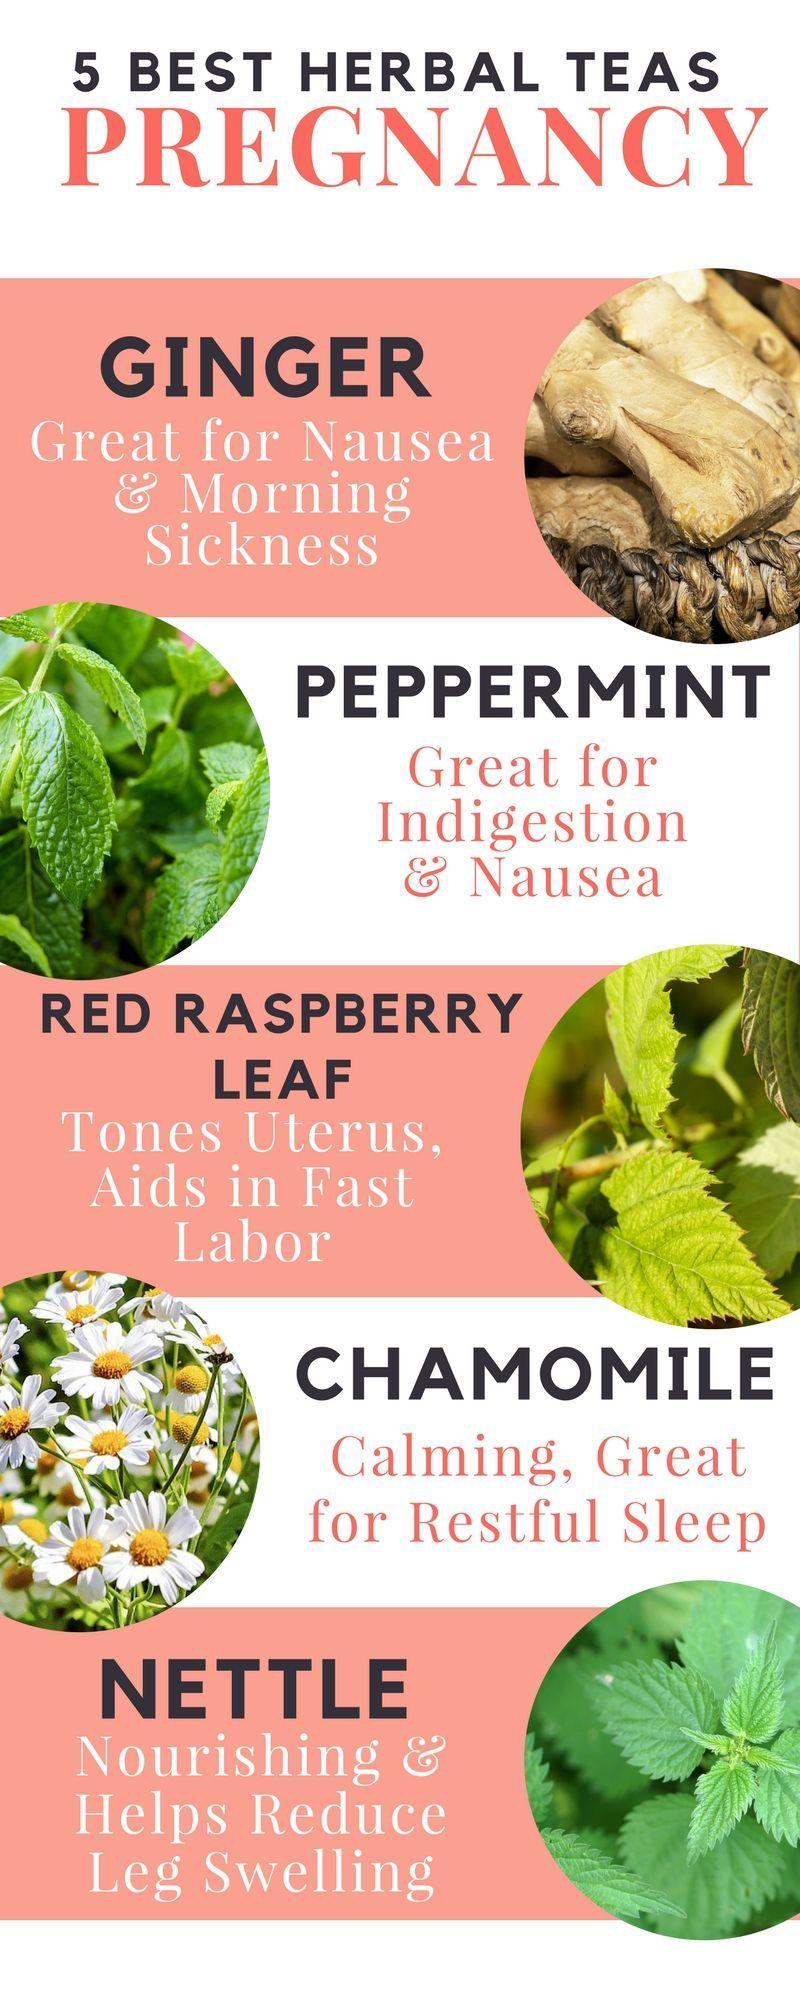 5 of the best herbal teas for pregnancy   ::: pregnancy